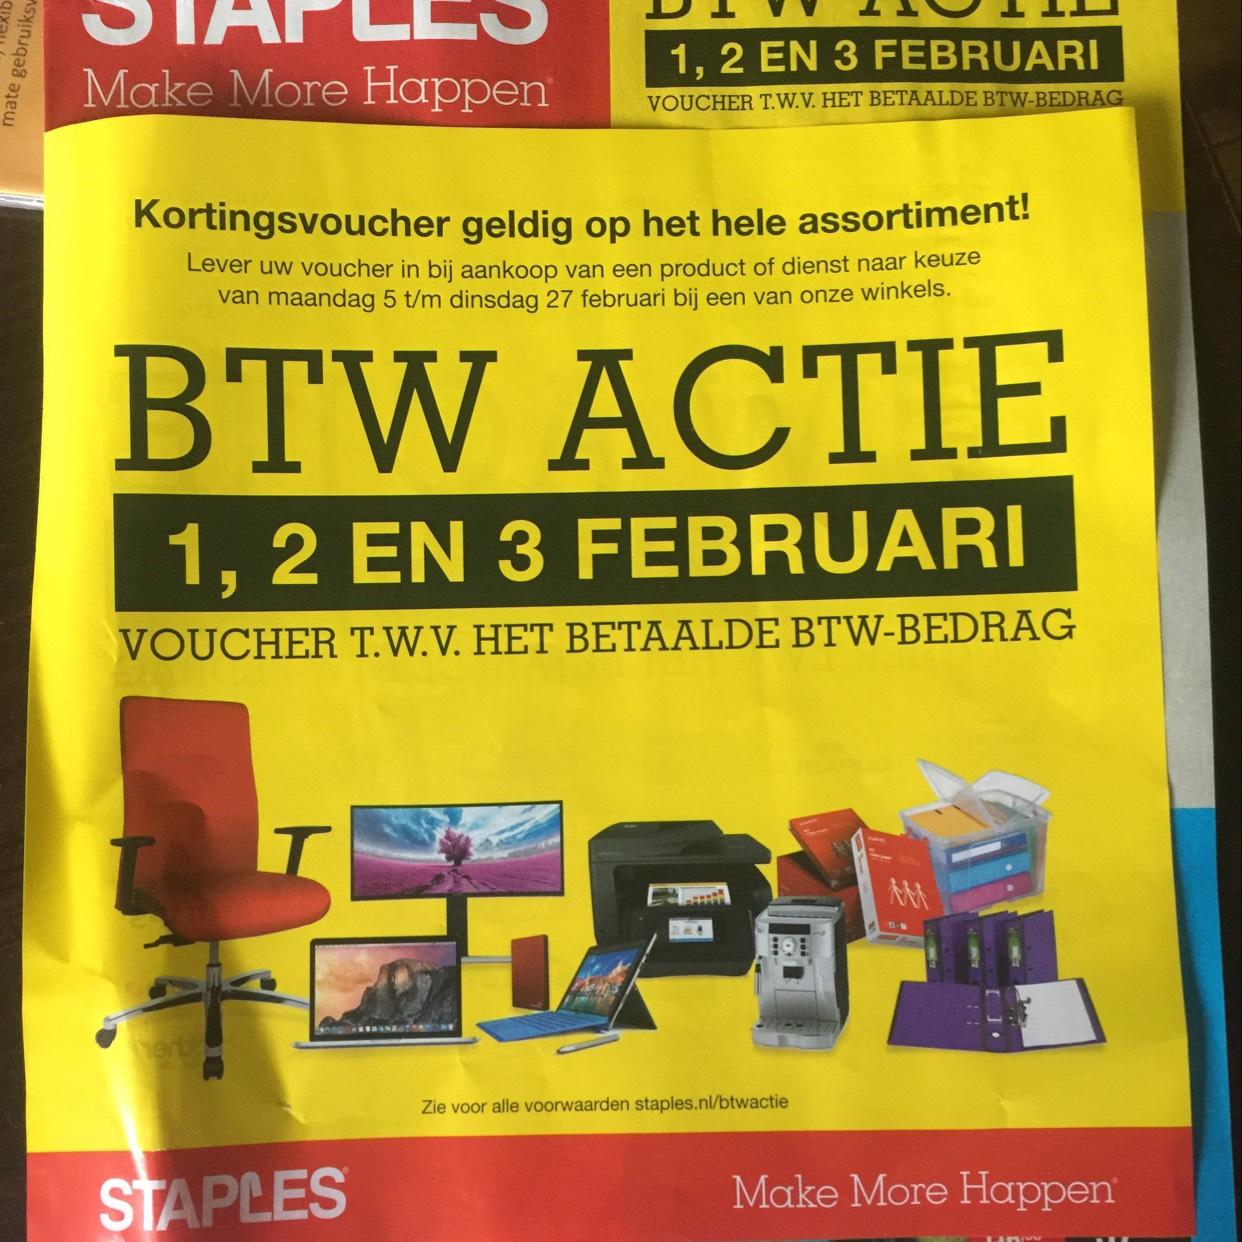 Btw actie staples 1, 2, 3 feb